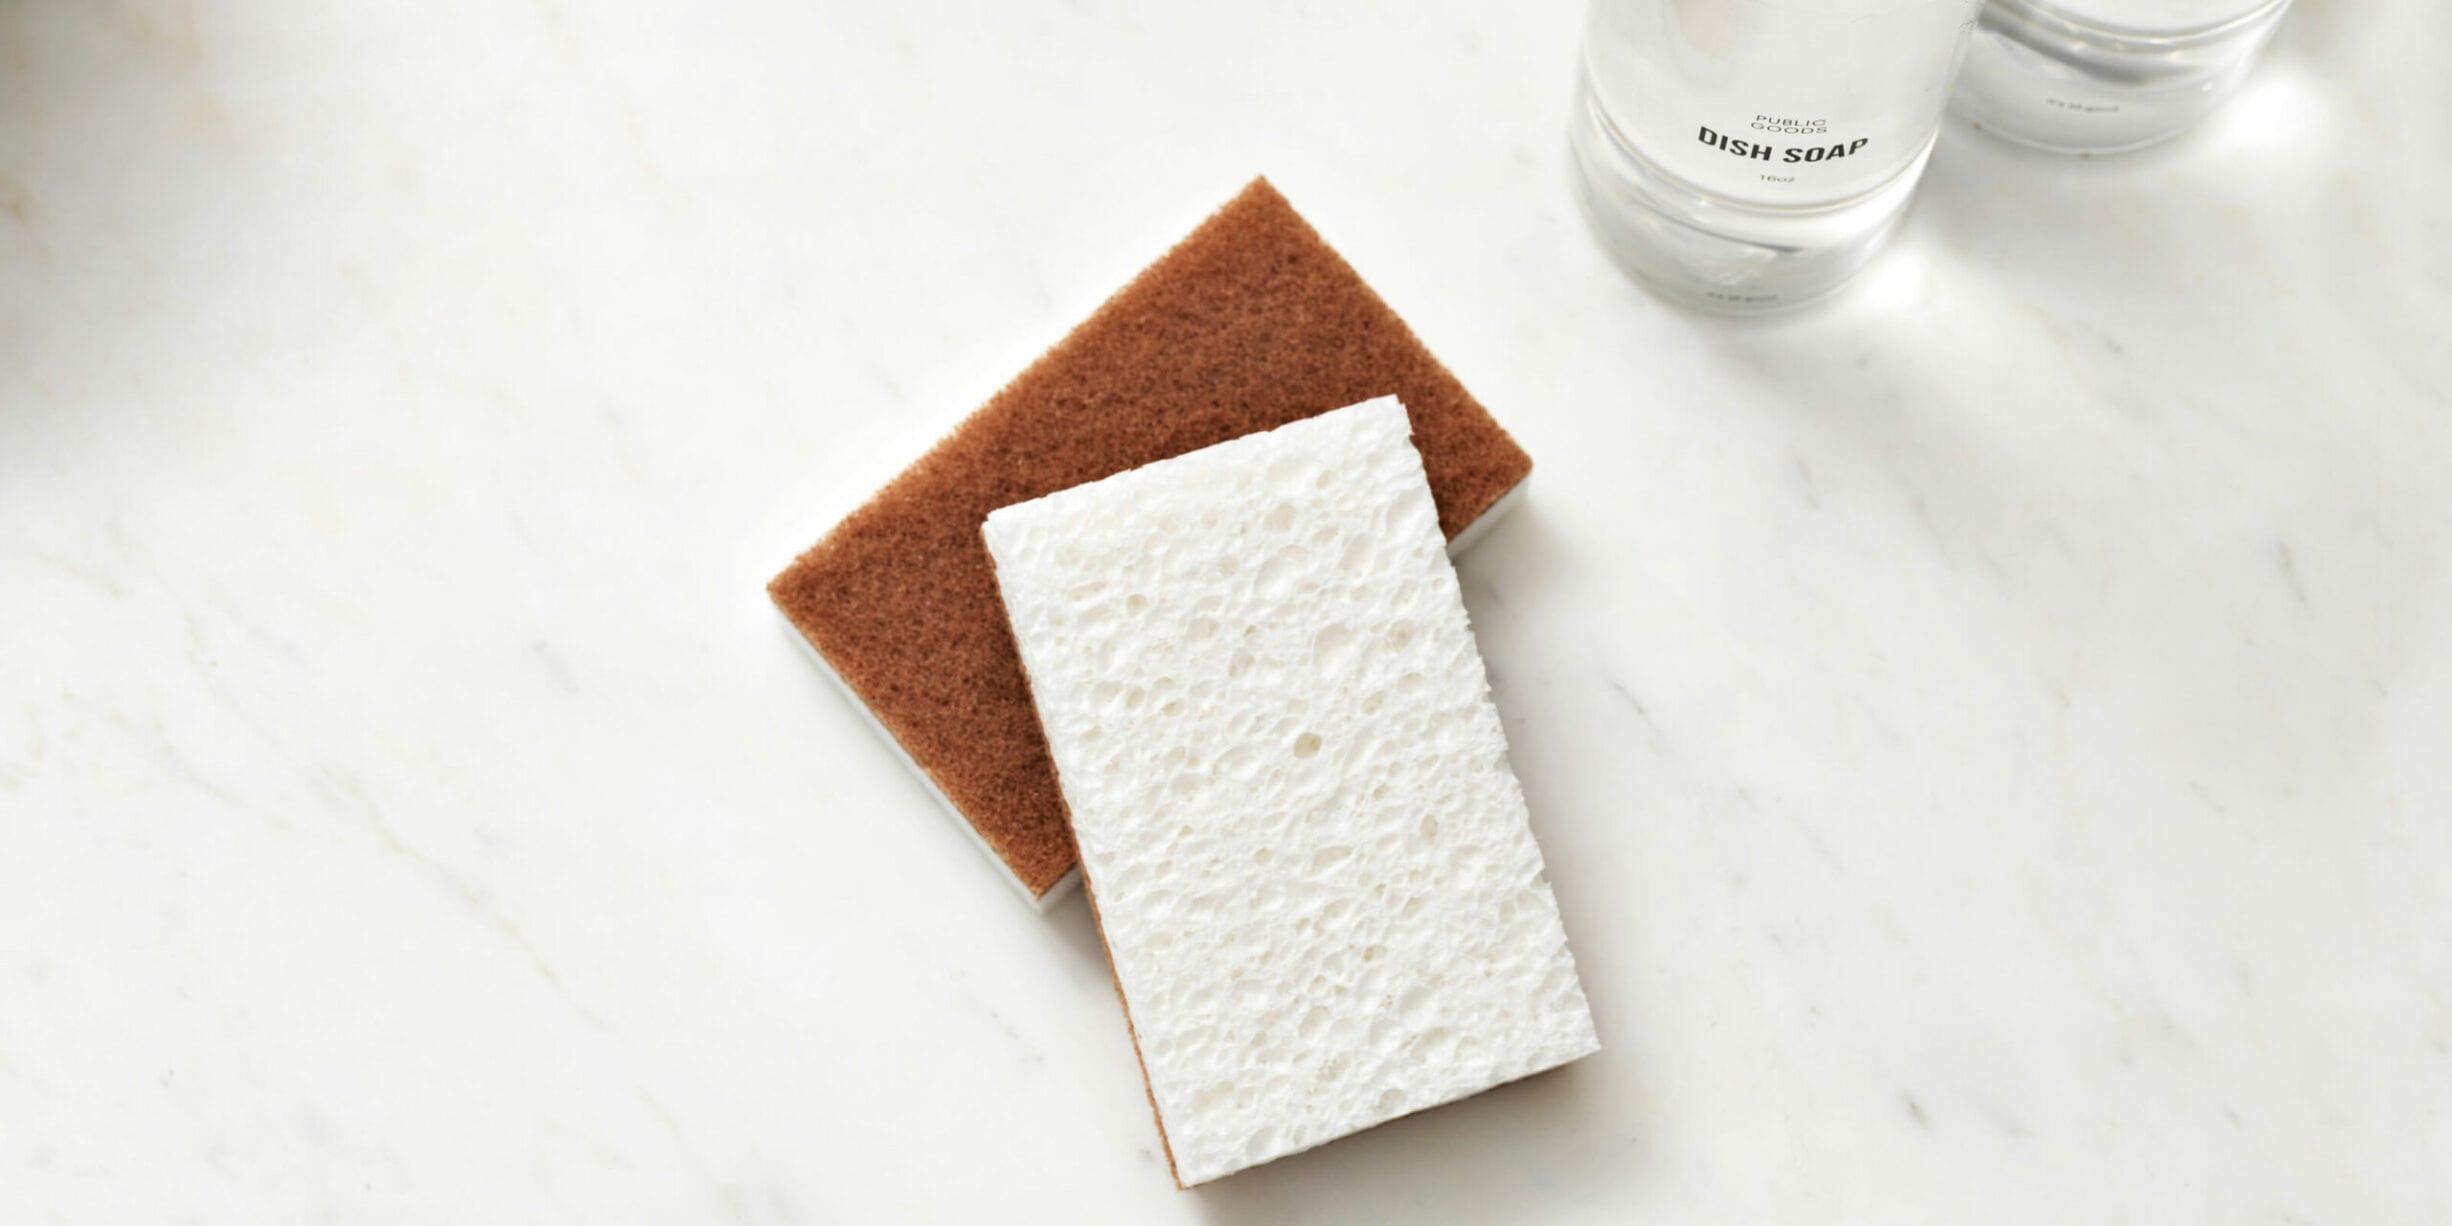 sponges, public goods cleaning products bottles